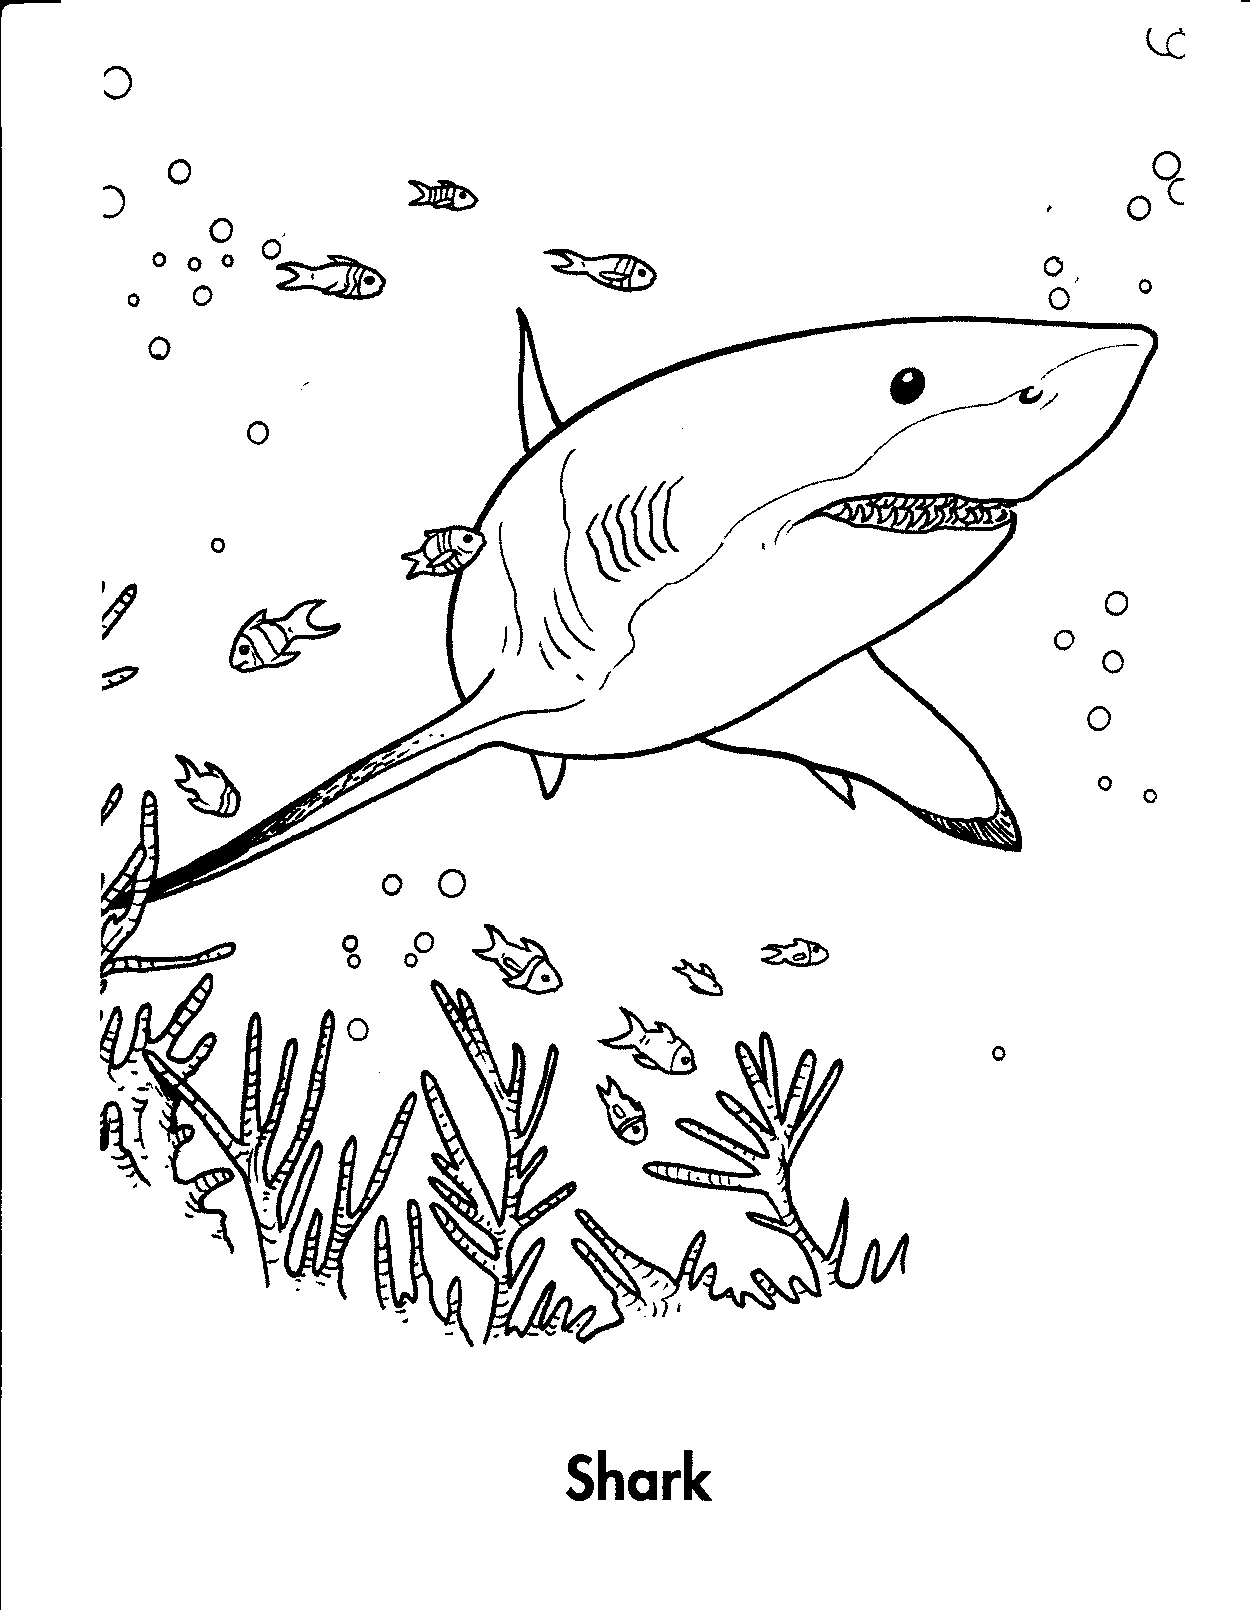 free printable shark coloring pages shark wax shark pages printable coloring free